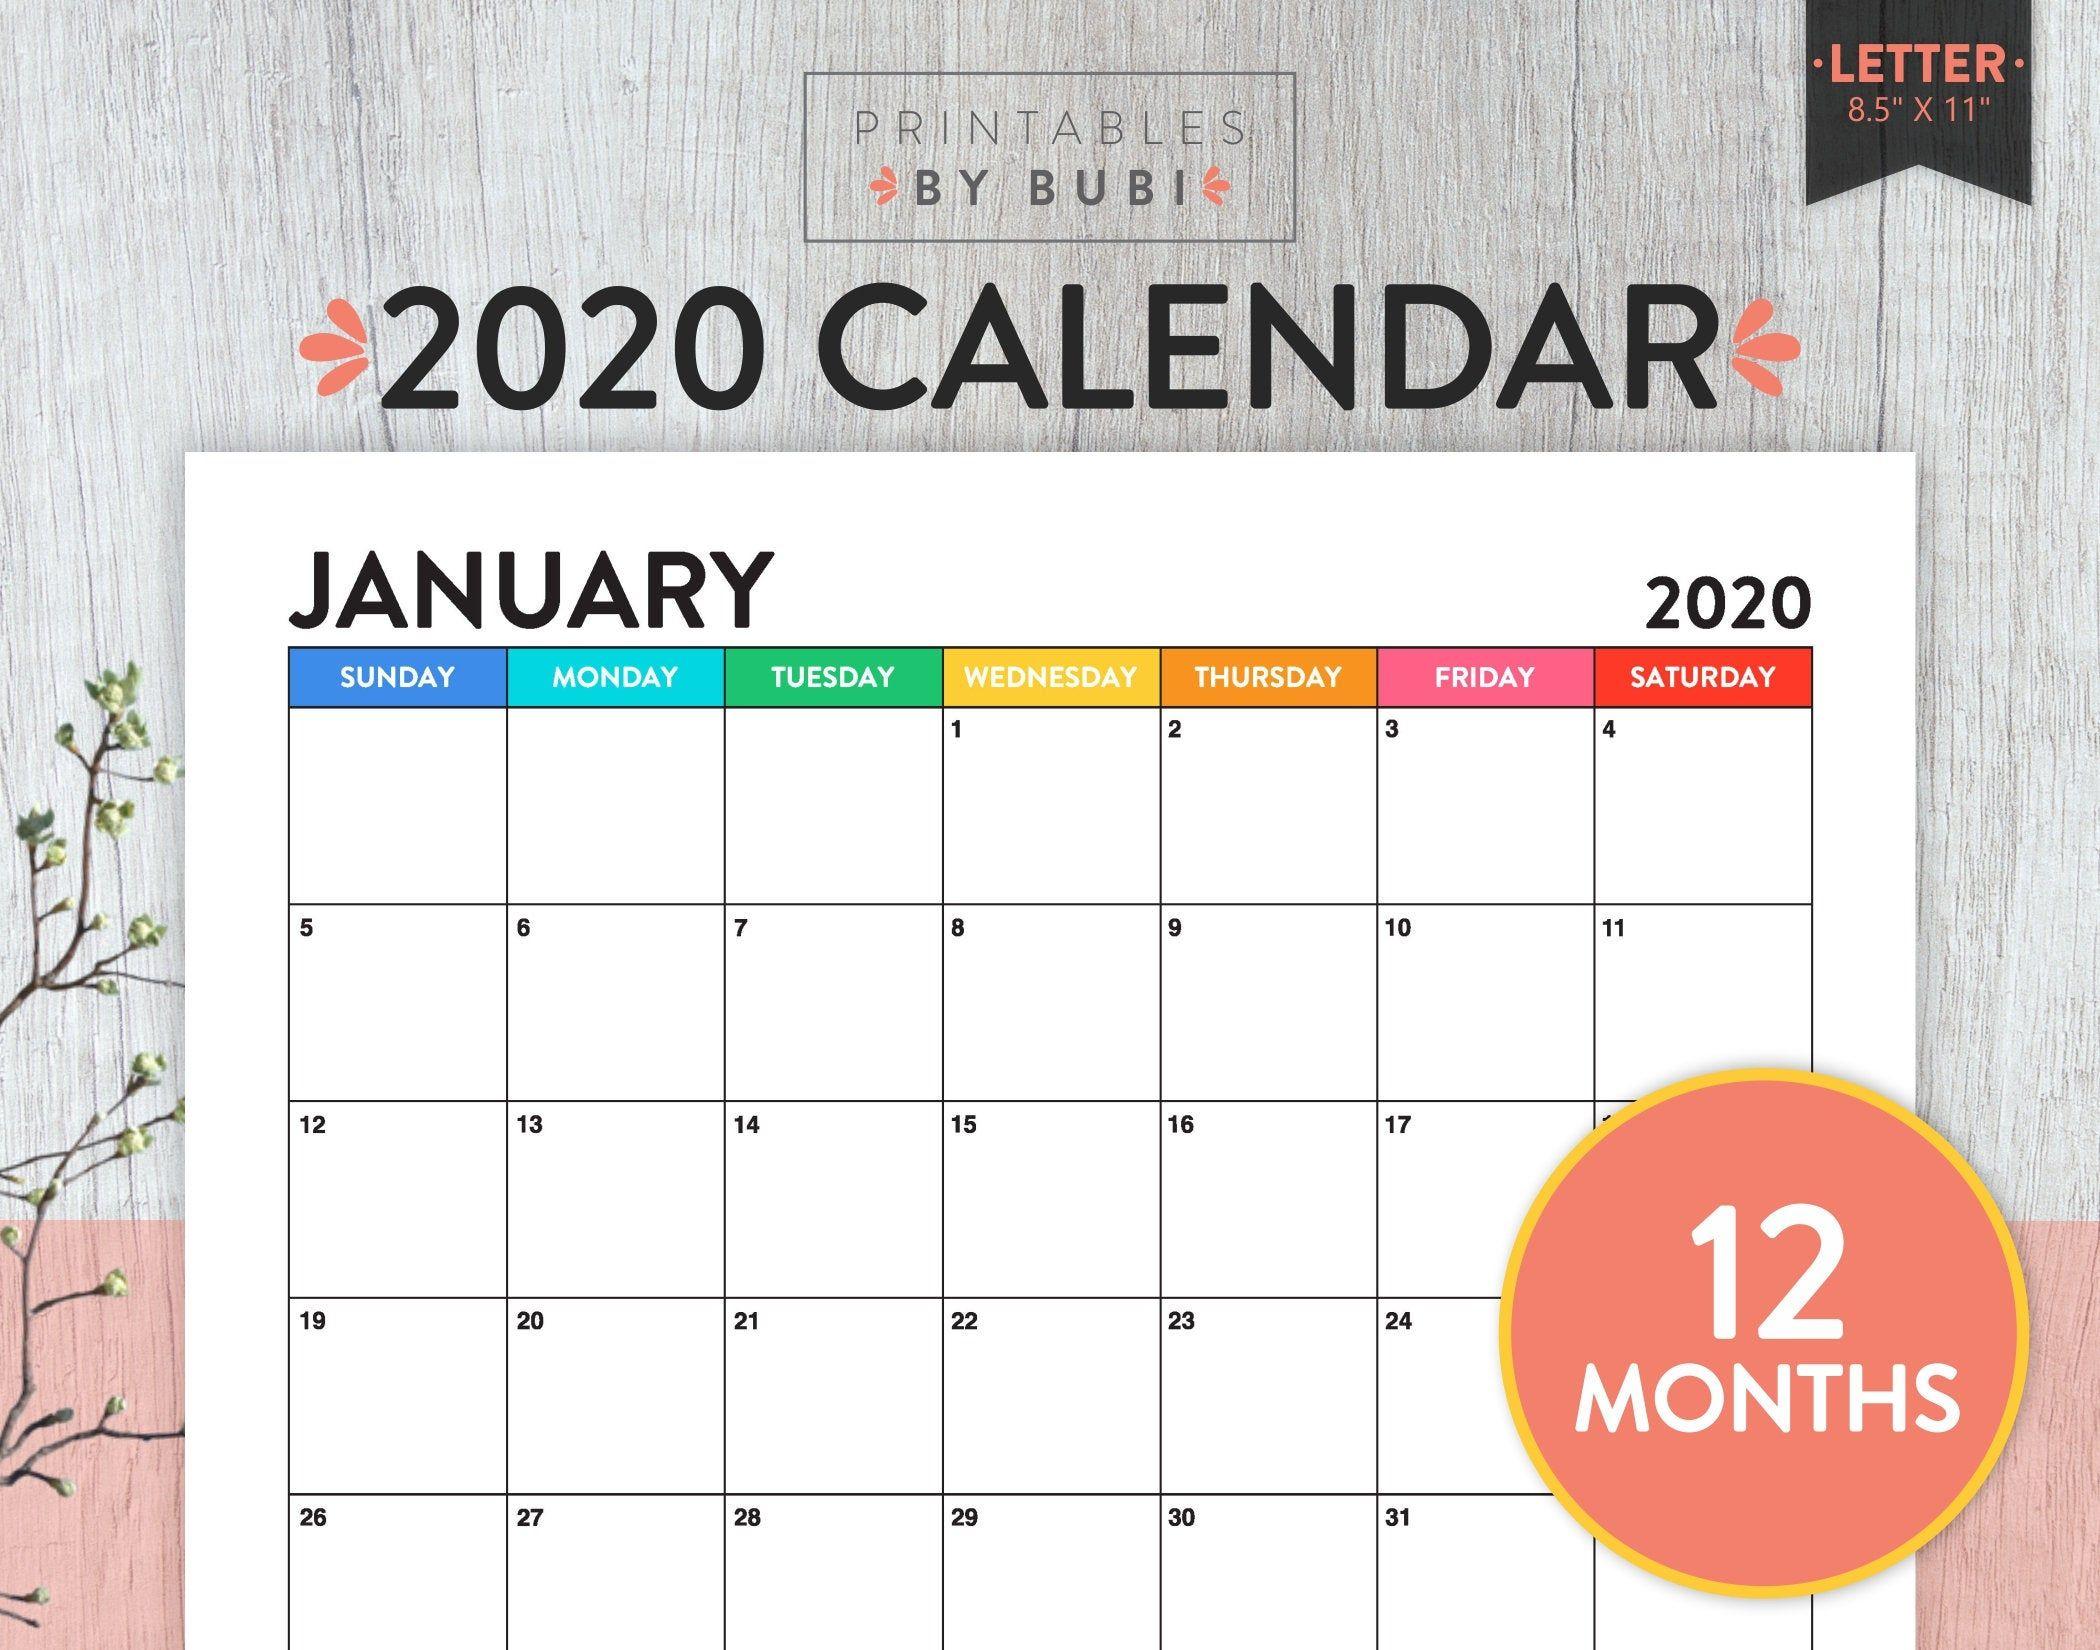 Printable Monthly Calendar 2020, Calendar Printable 2020